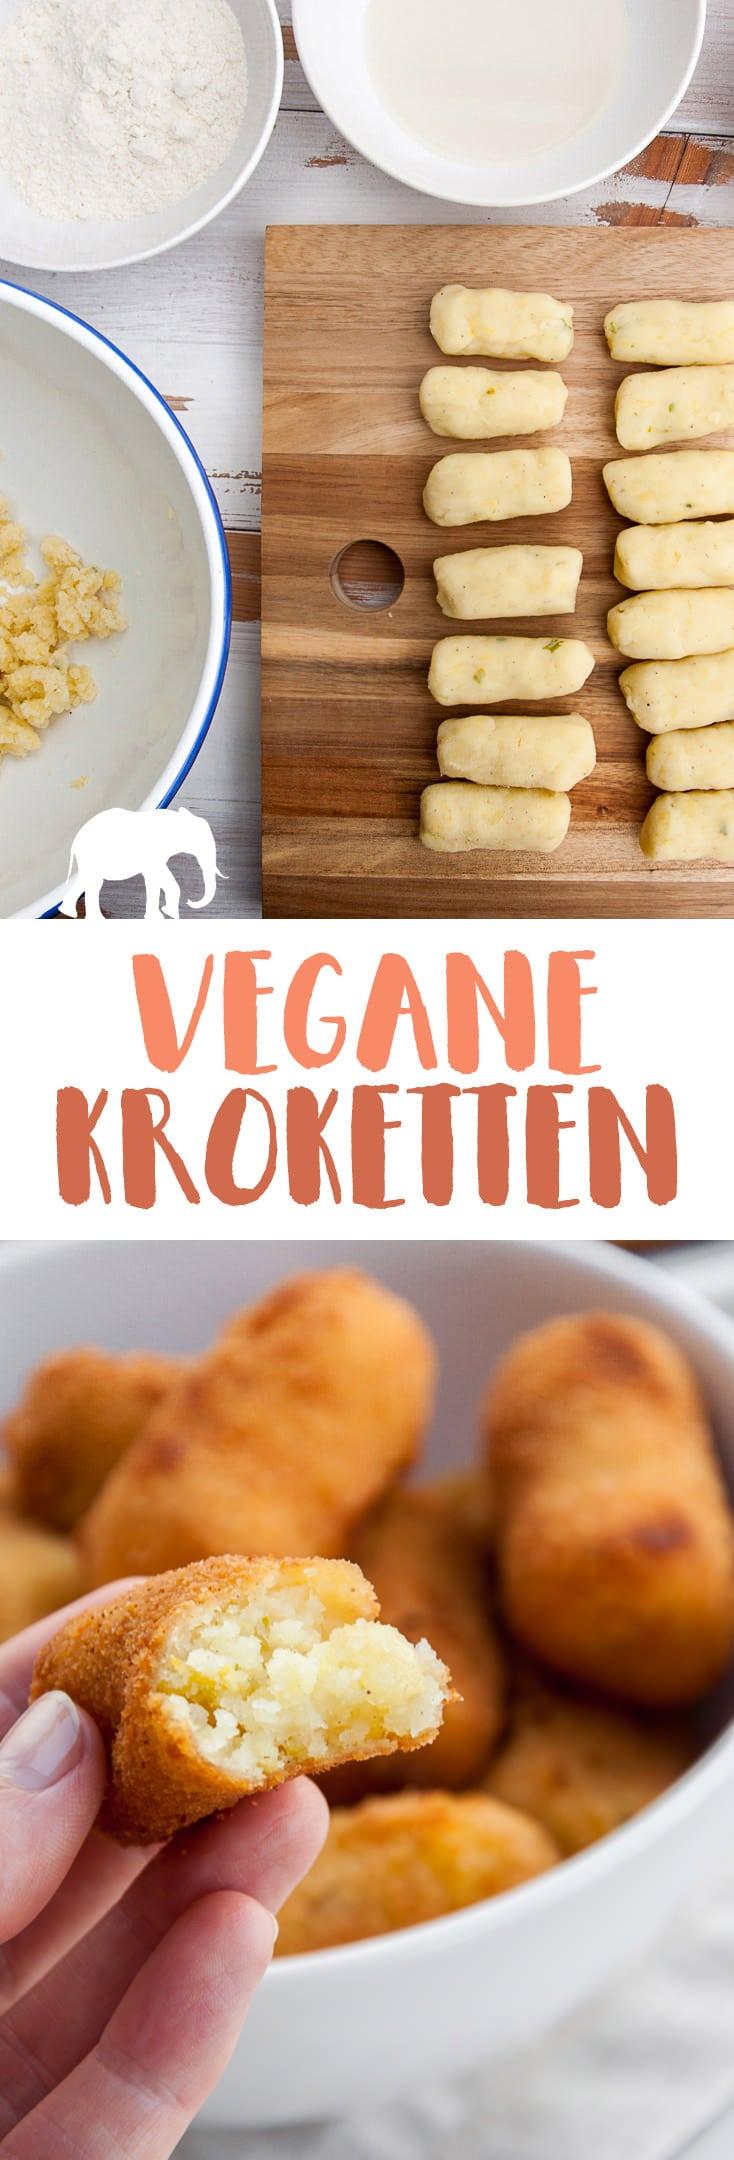 Vegane Kroketten - außen knusprig, innen weich #vegan #kroketten